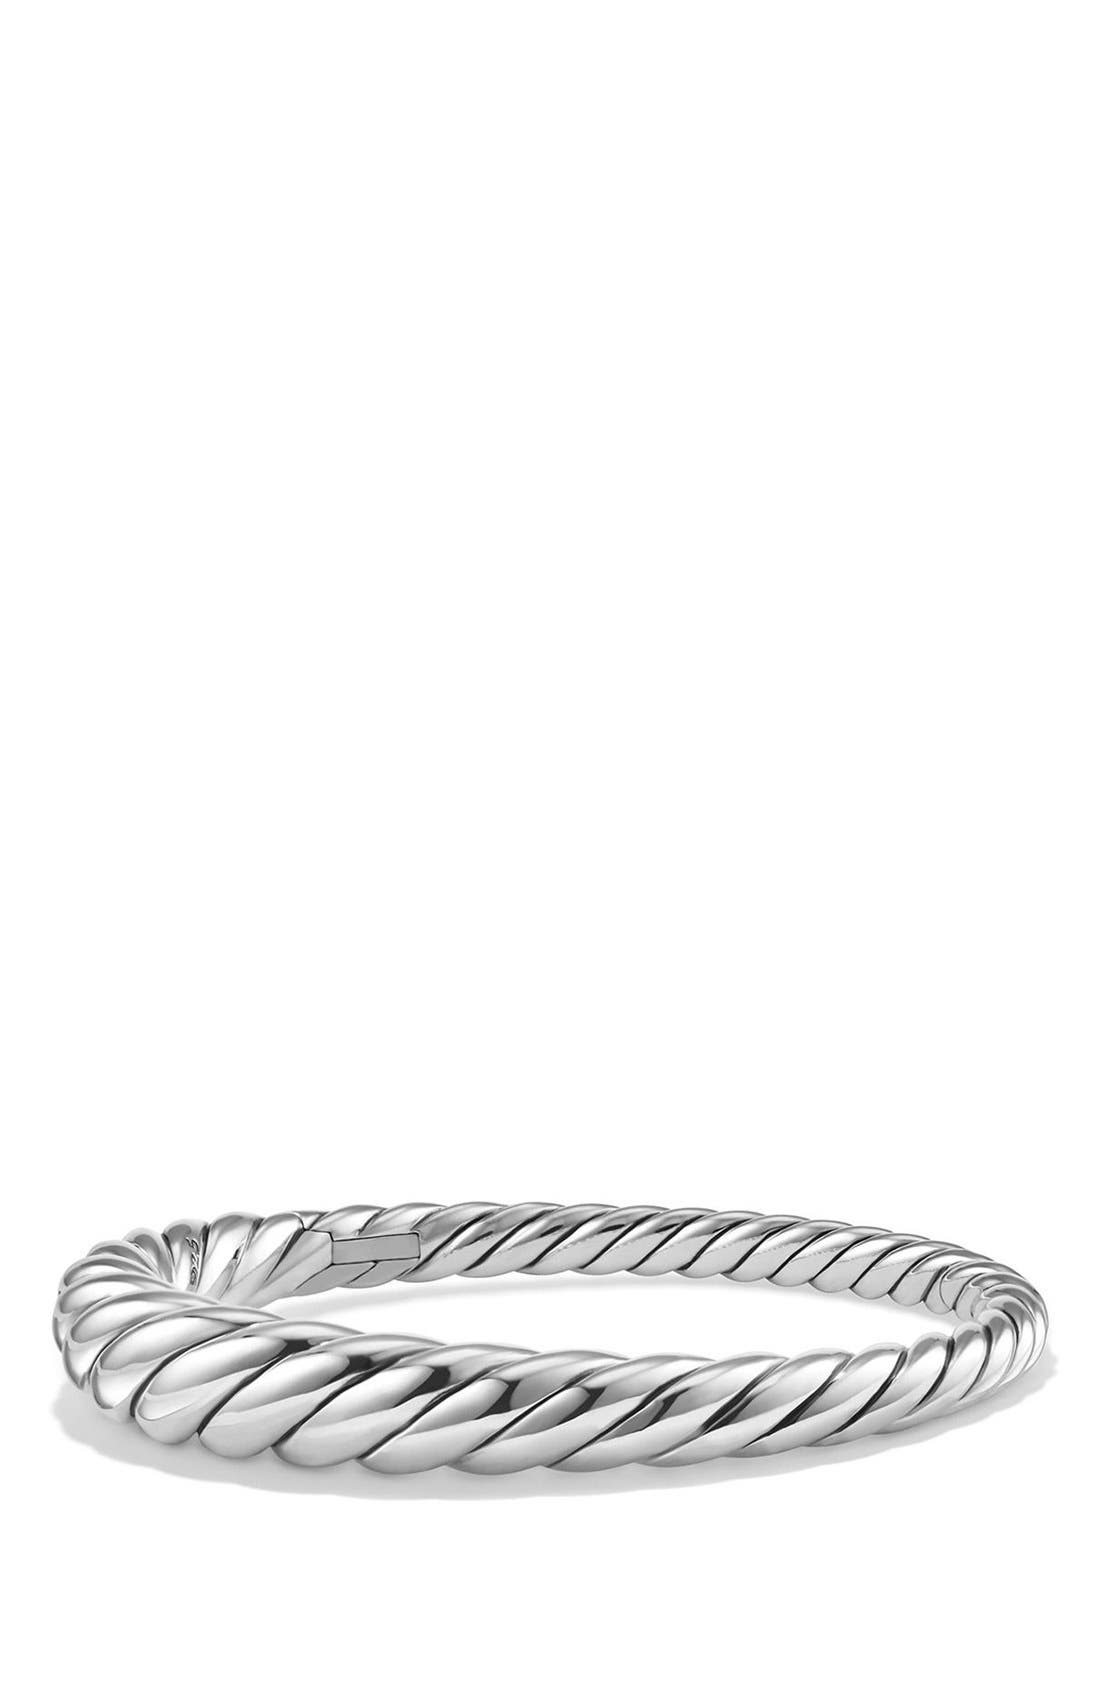 David Yurman 'Pure Form' Small Cable Bracelet